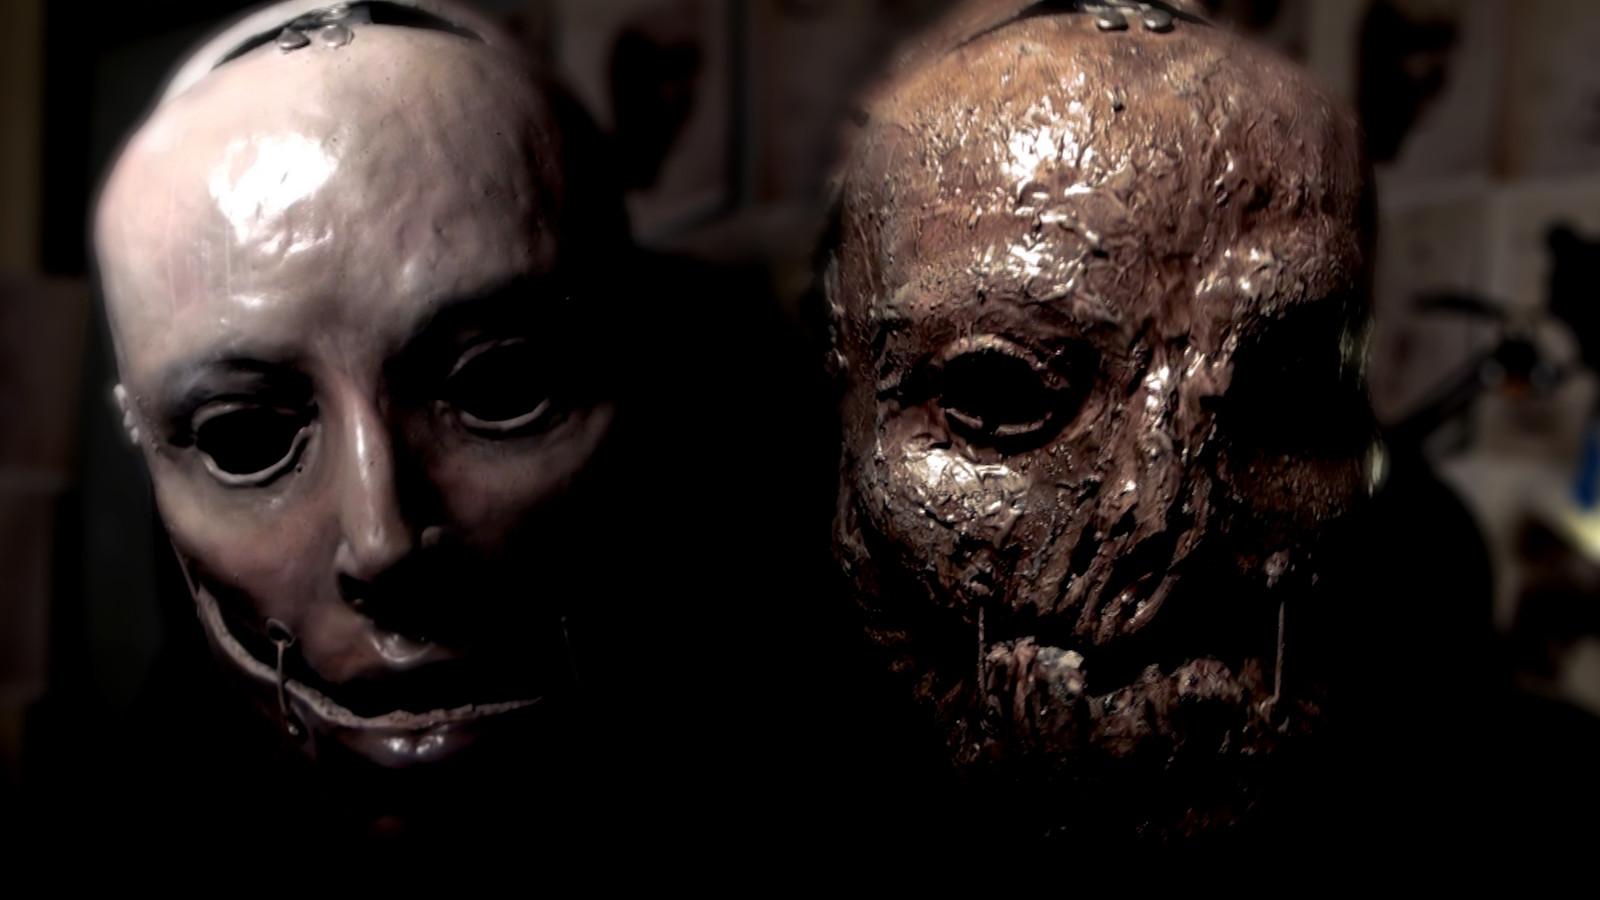 Paradox (2013) - Alternate of the original Stigmata mask